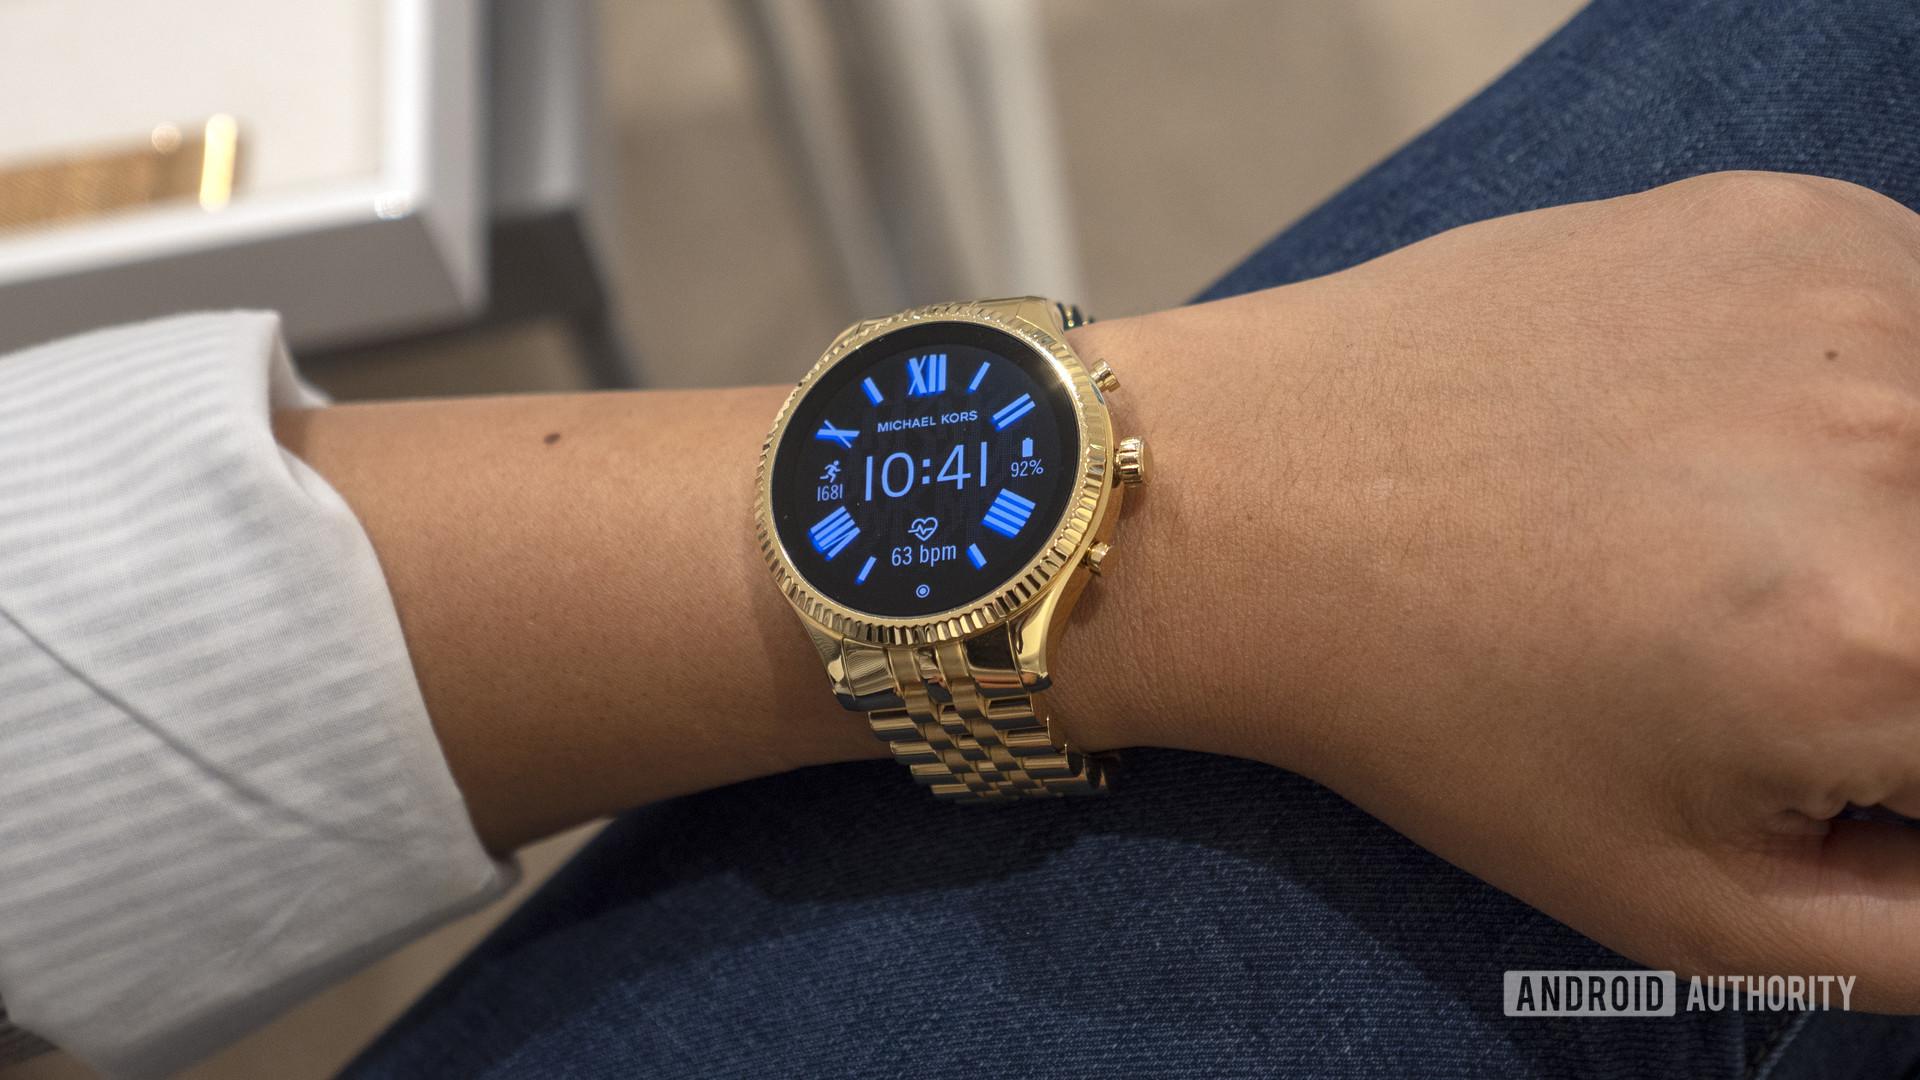 Michael Kors Lexington 2 Wear OS smartwatch 3